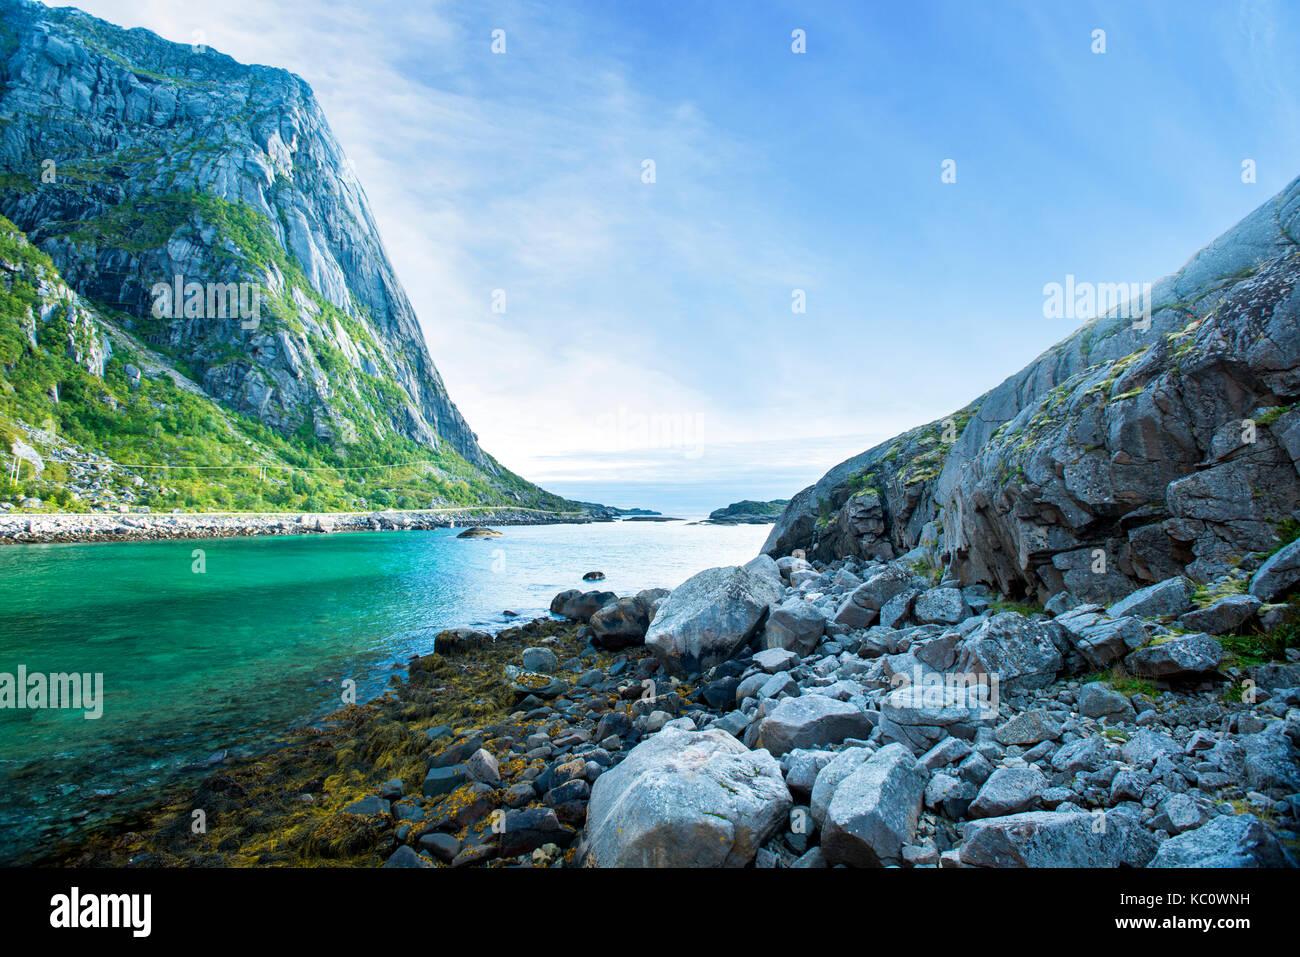 Surplombant la mer depuis près de Djupfjorden, Henningsvaer Lofoten, Norvège. Photo Stock